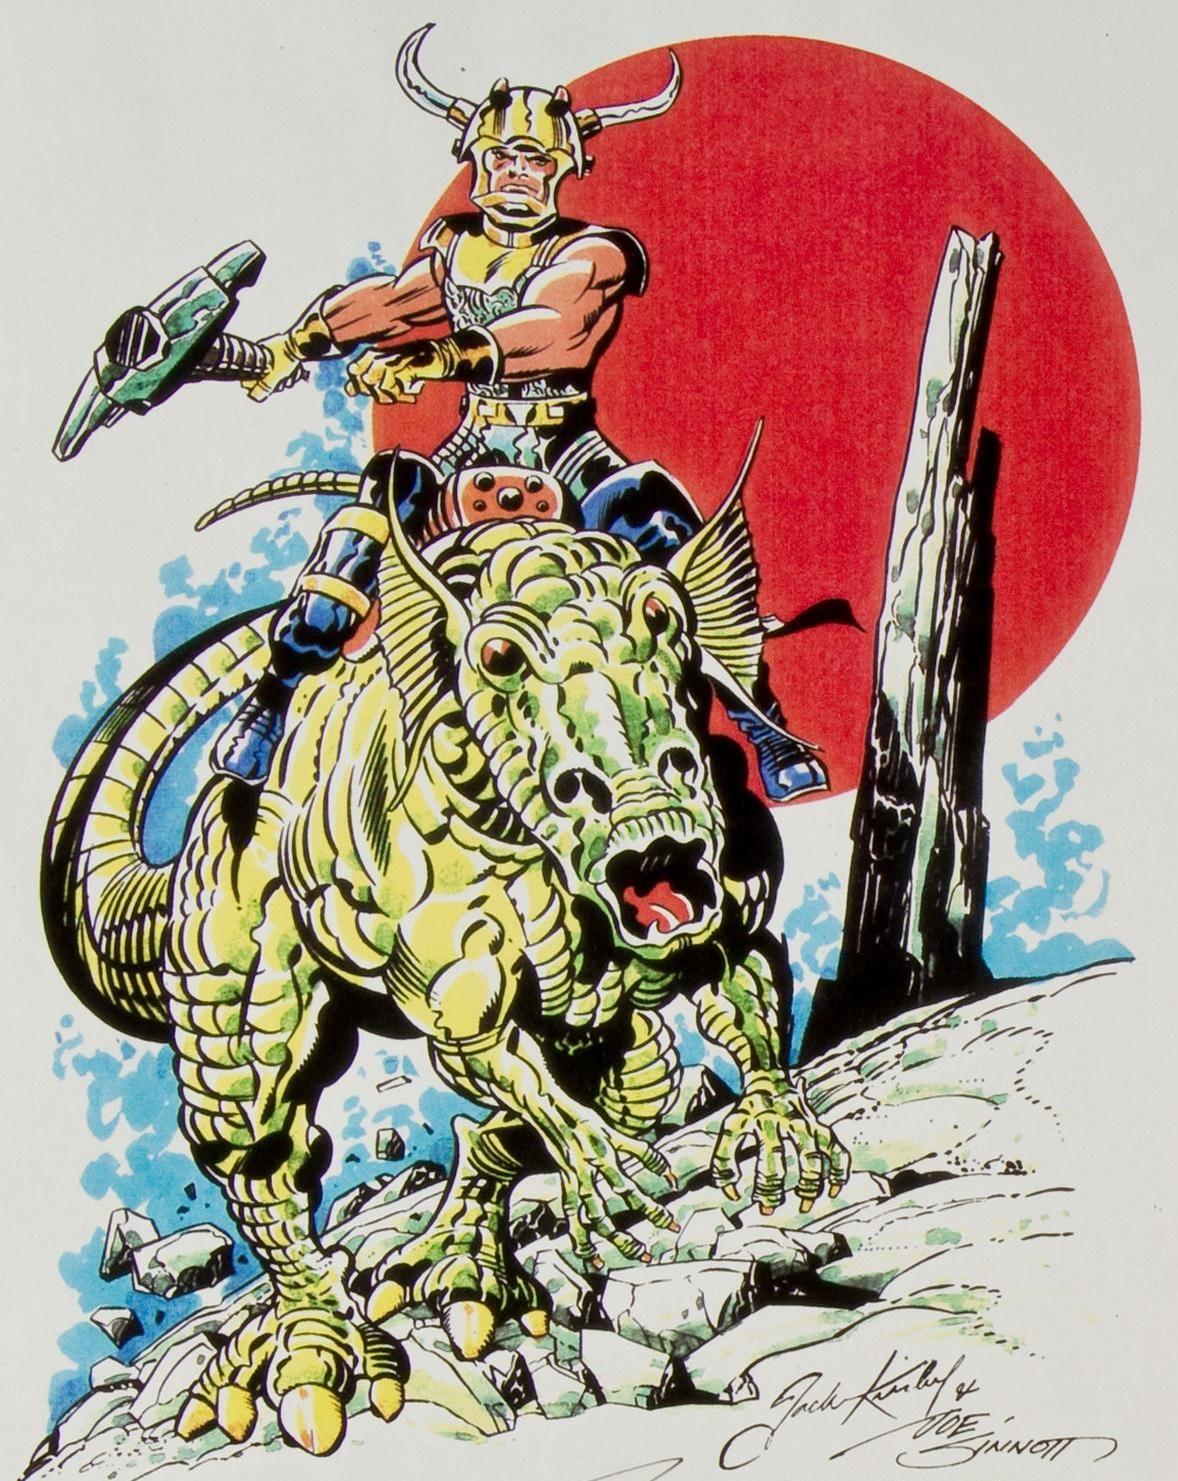 Cap'n's Comics: Kosmic Jack Kirby